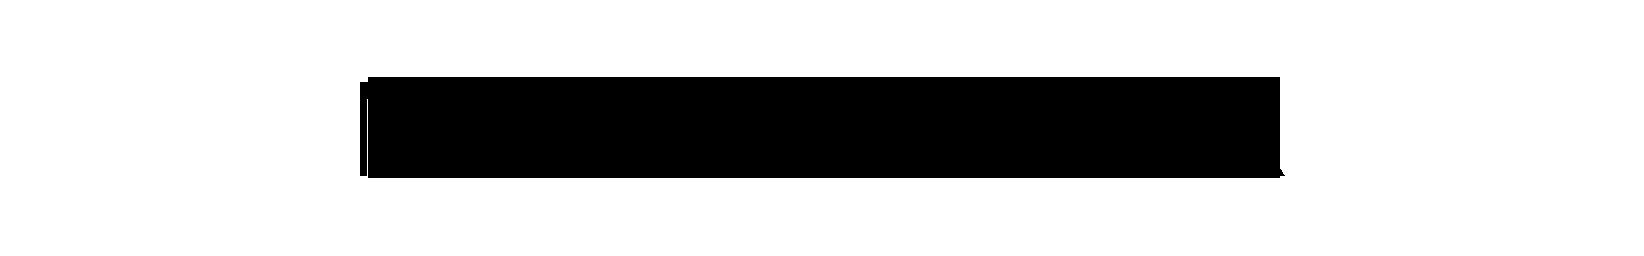 zyE28B.png